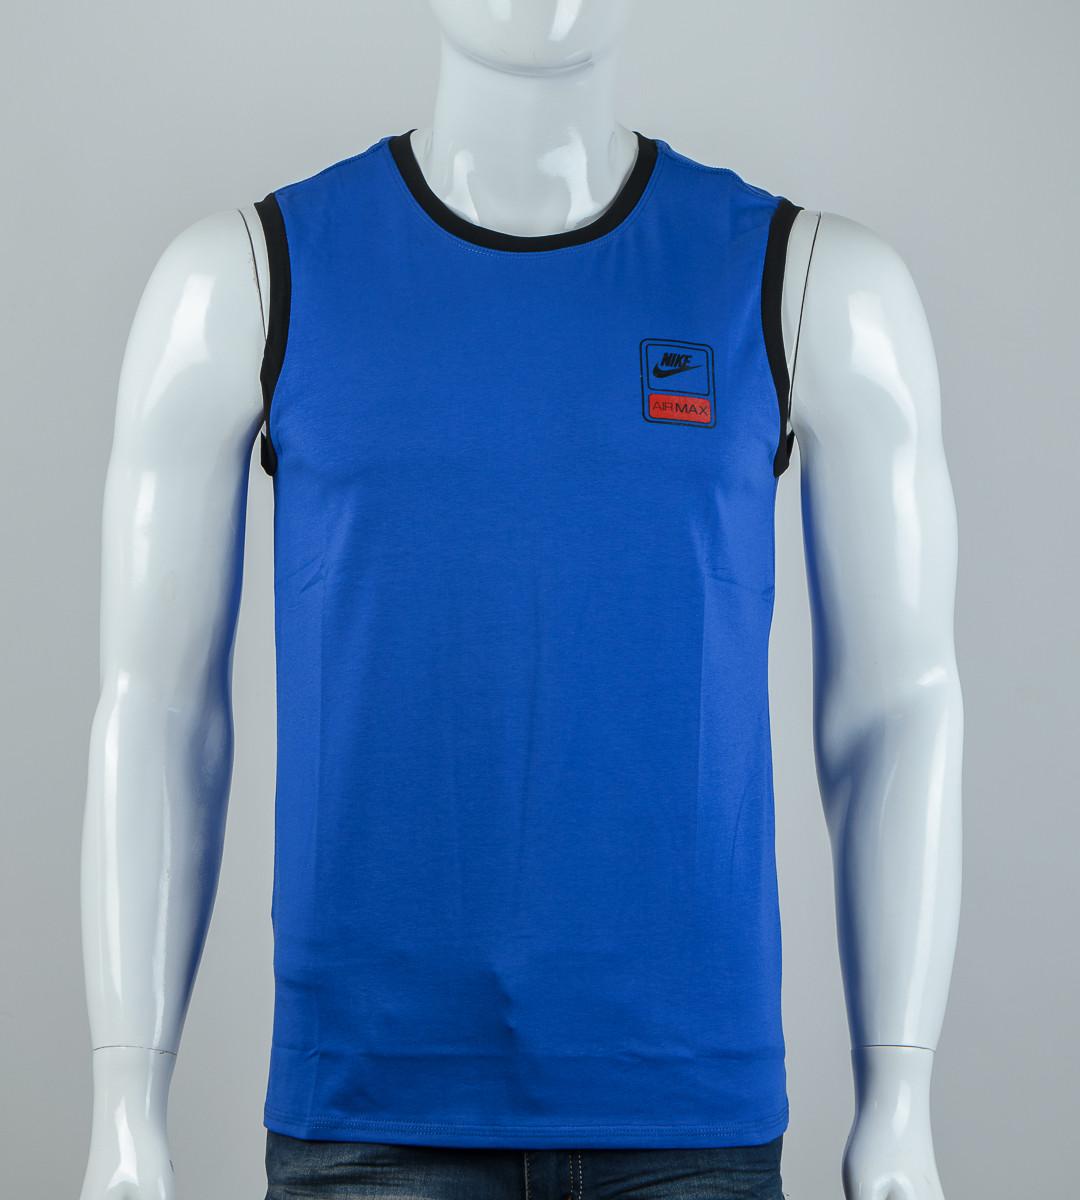 Безрукавка мужская Nike (2060бм), Электрик